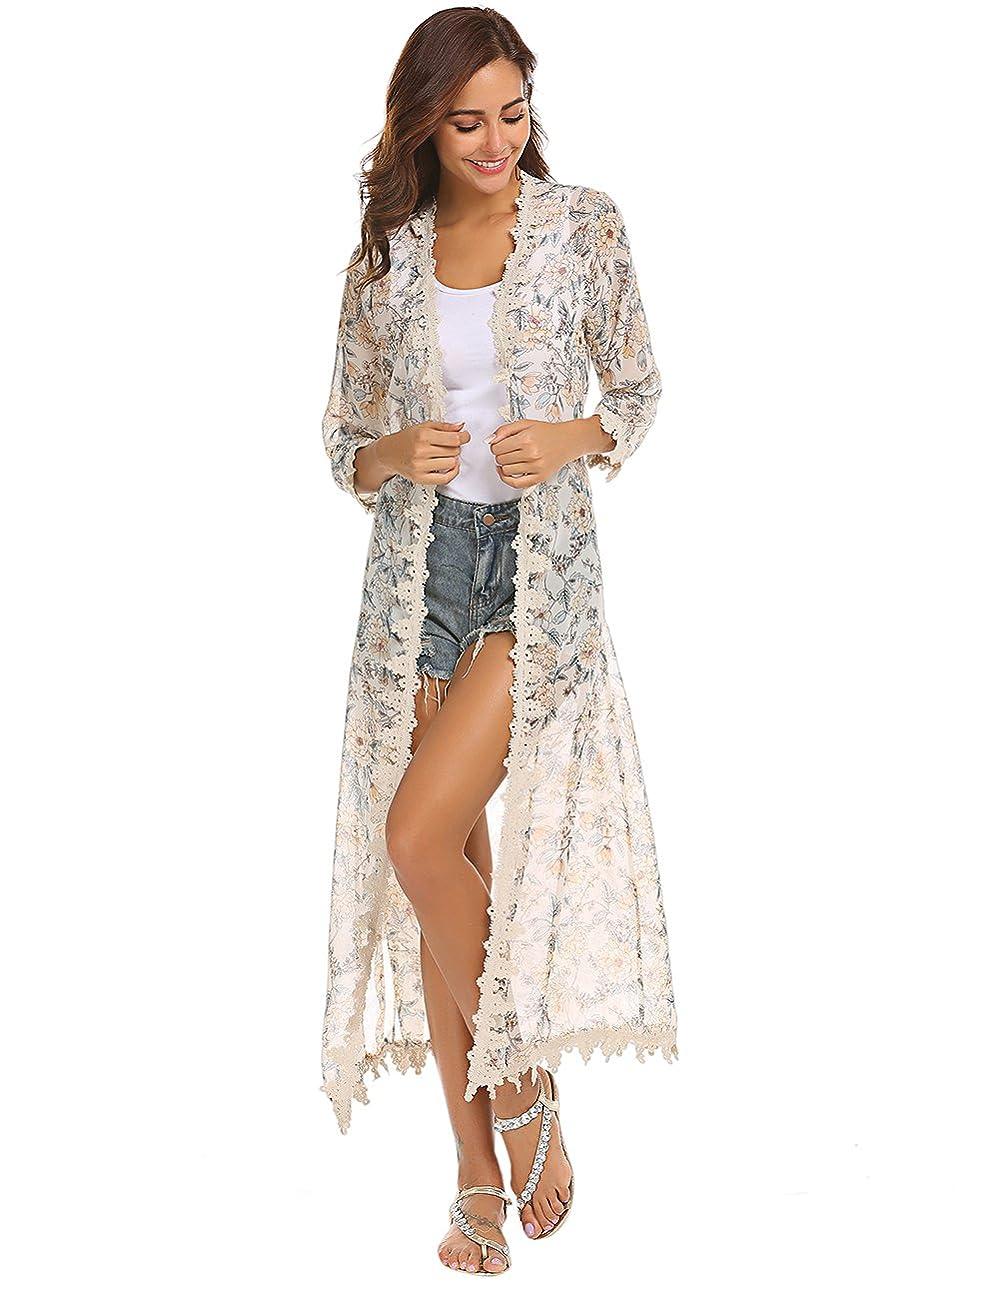 Women's 3/4 Sleeve Long Chiffon Floral Kimono Cardigan Crochet Lace Trim Beach Cover up